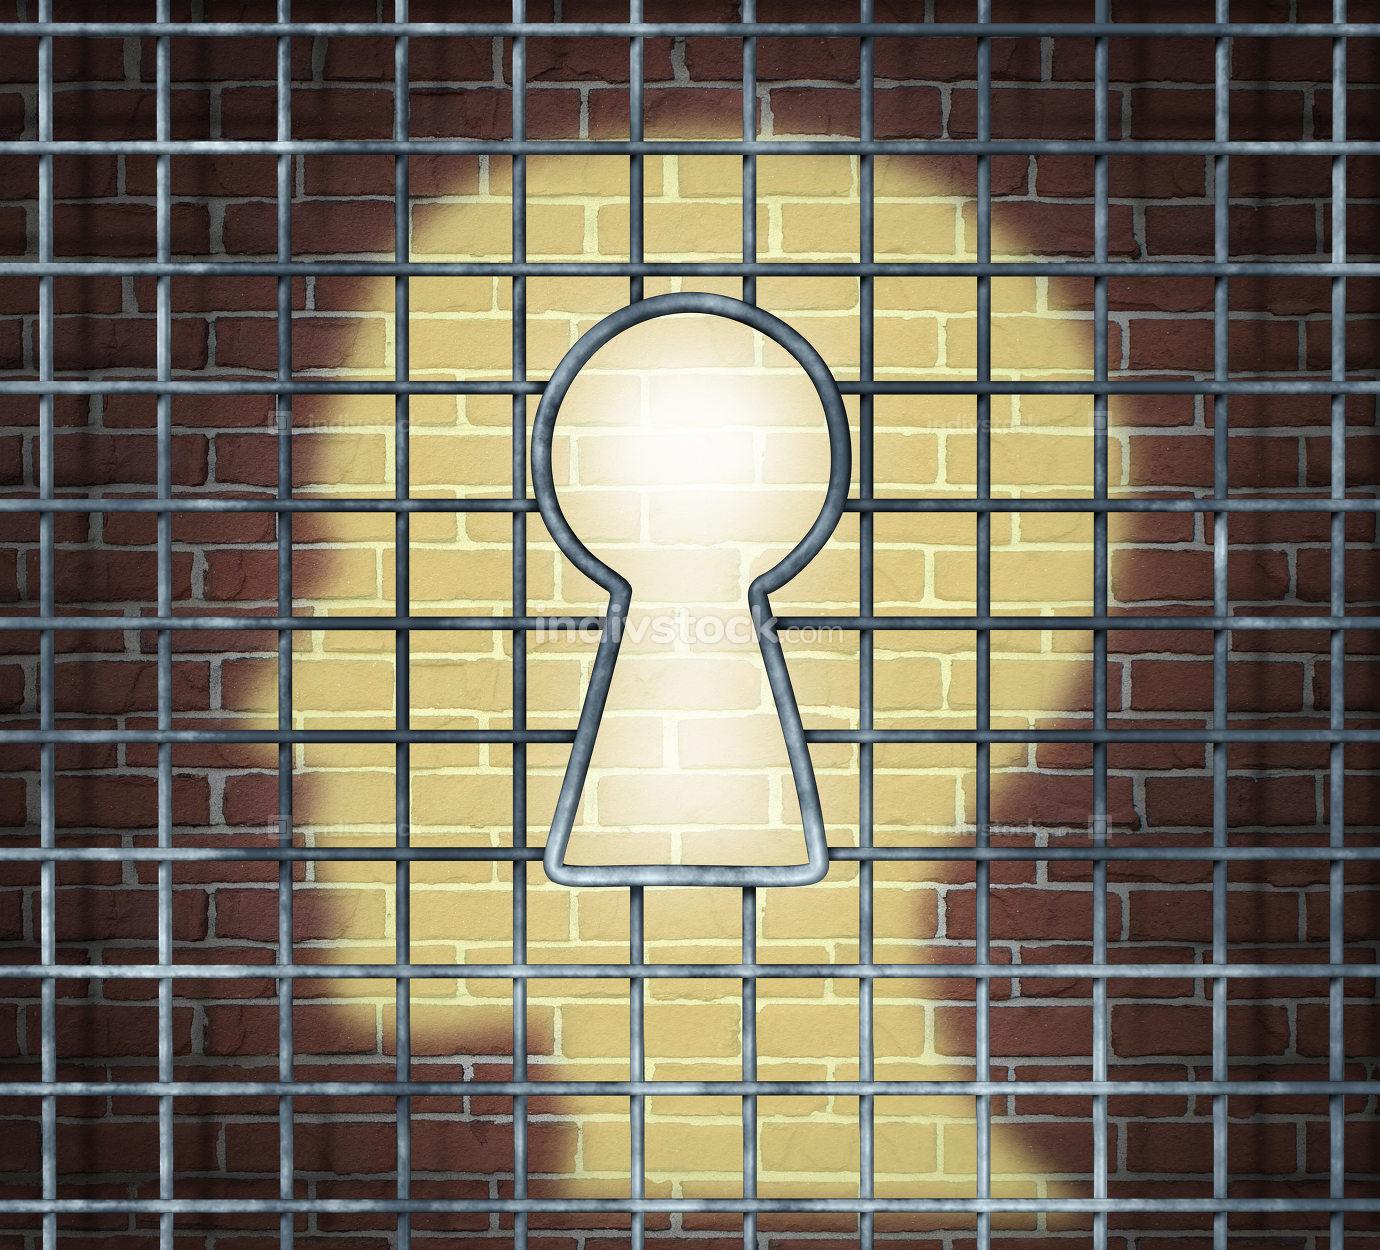 Creative Freedom Key